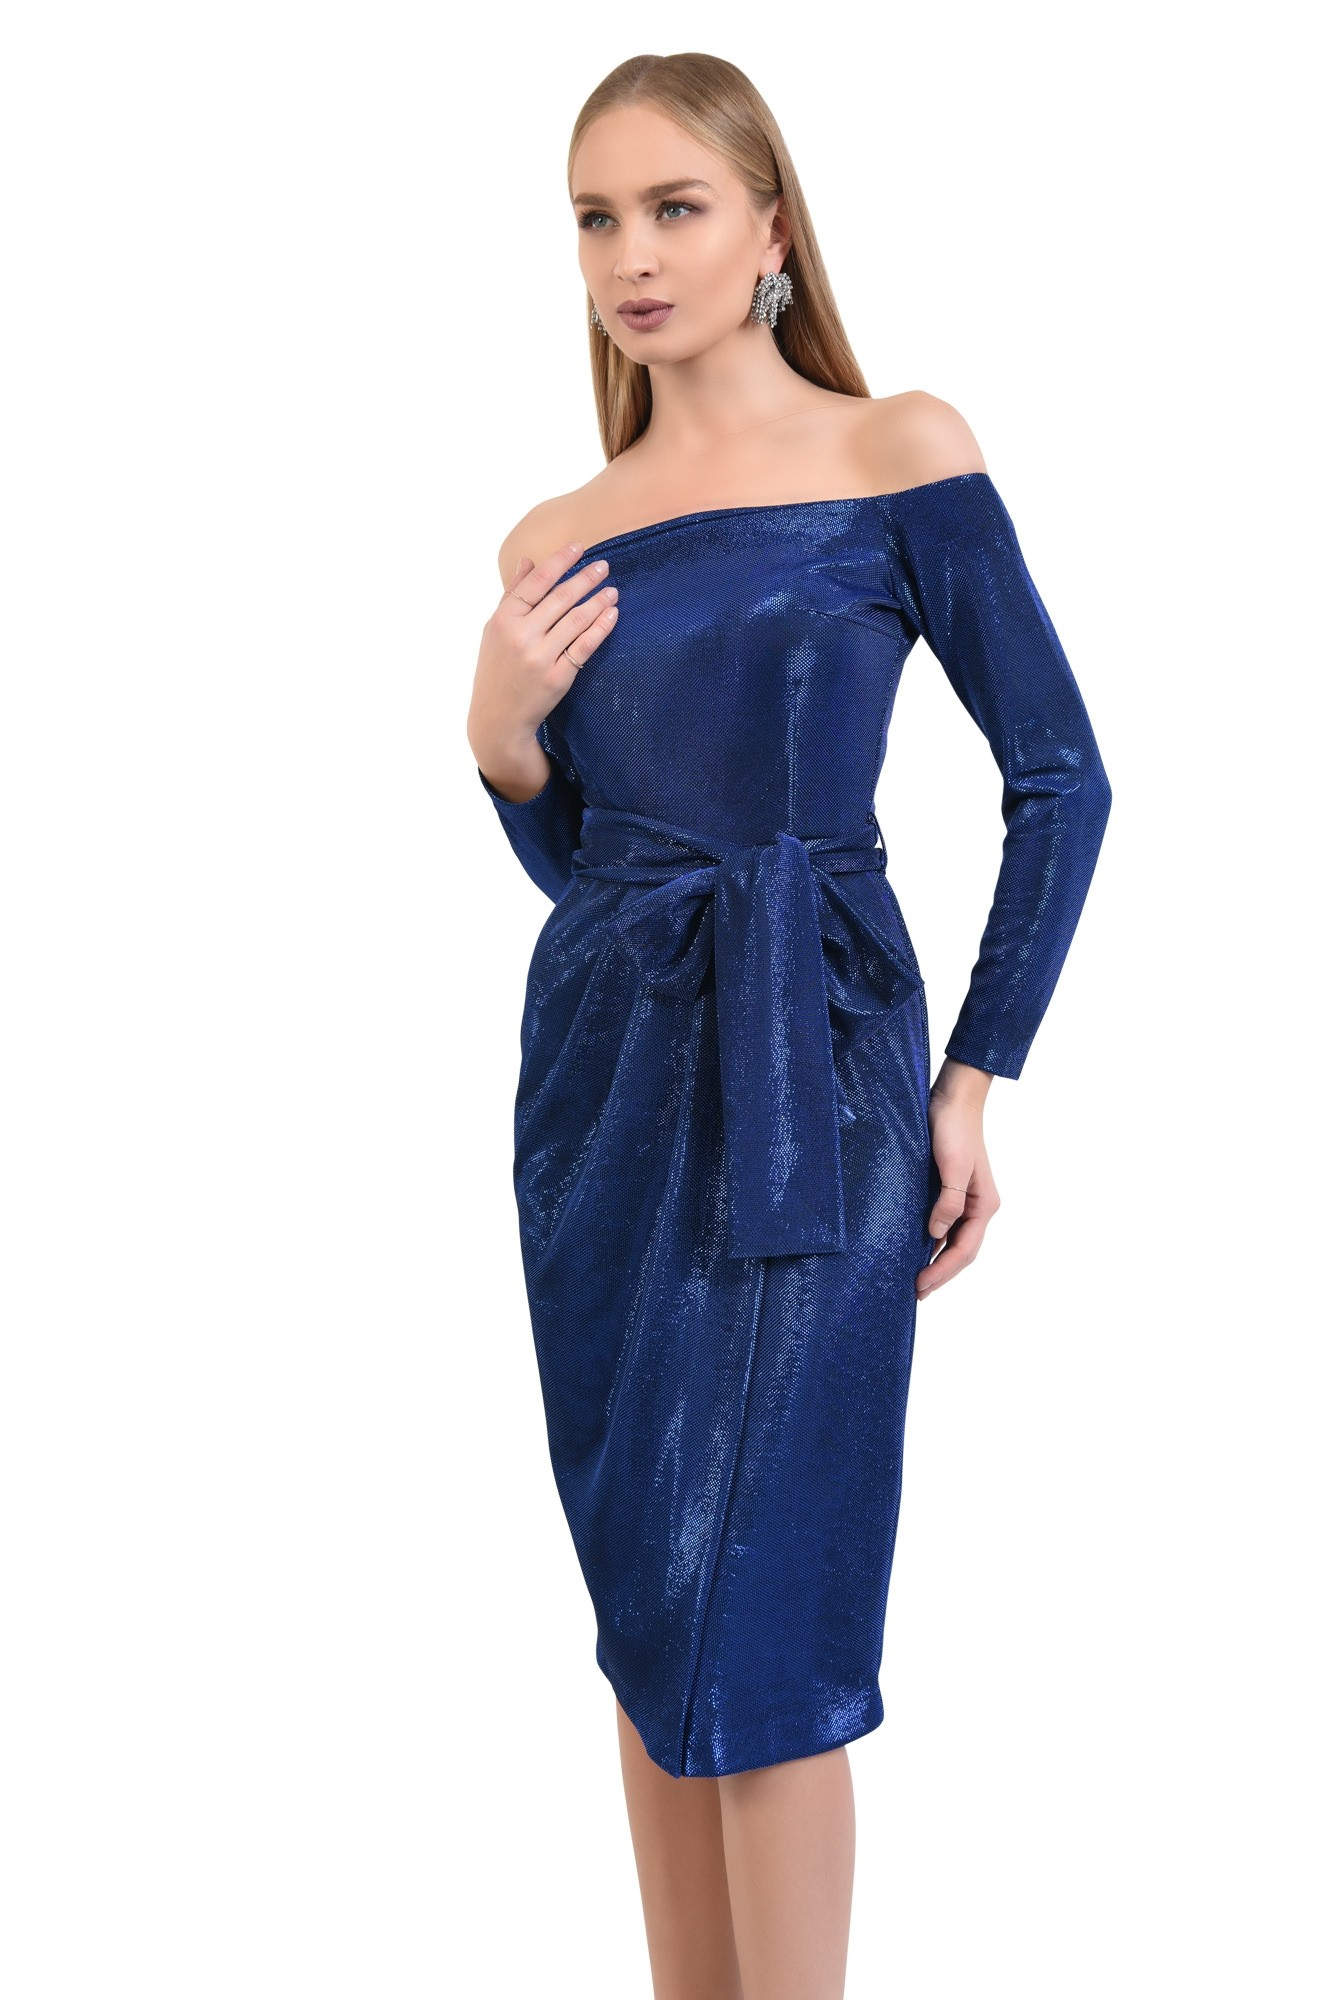 0 - rochie eleganta, midi, conica, cu cordon, rochii online